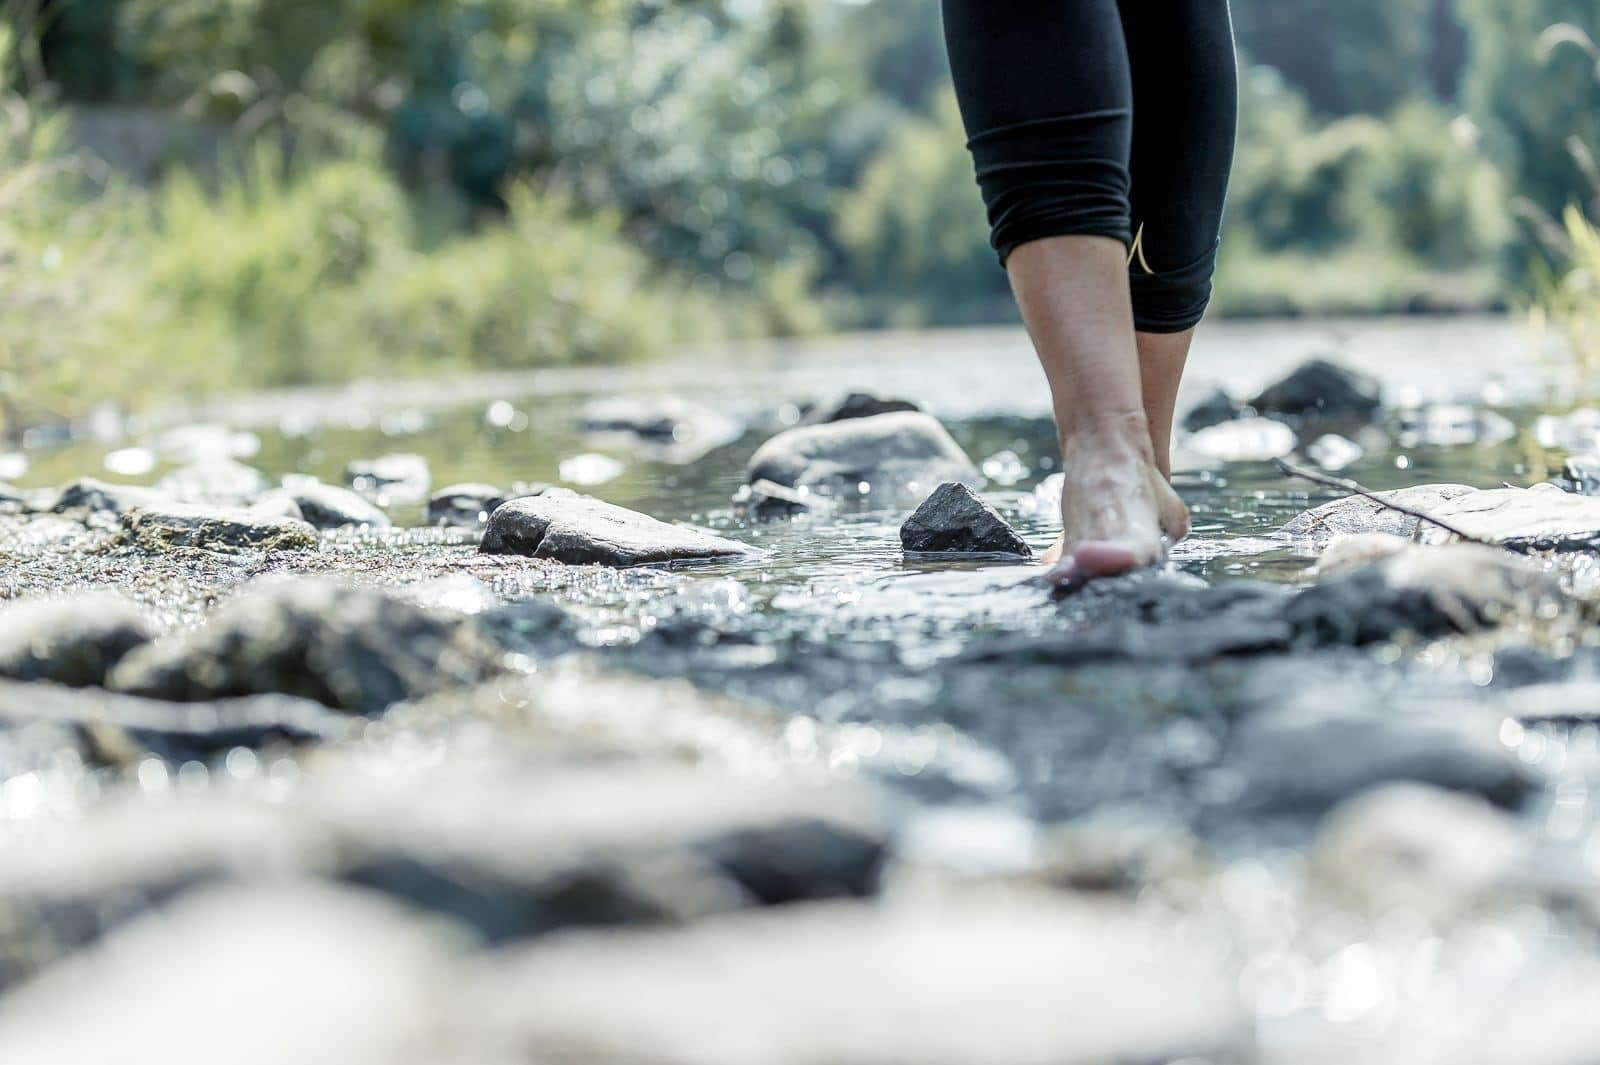 Frau läuft Barfuß durch Flussbett